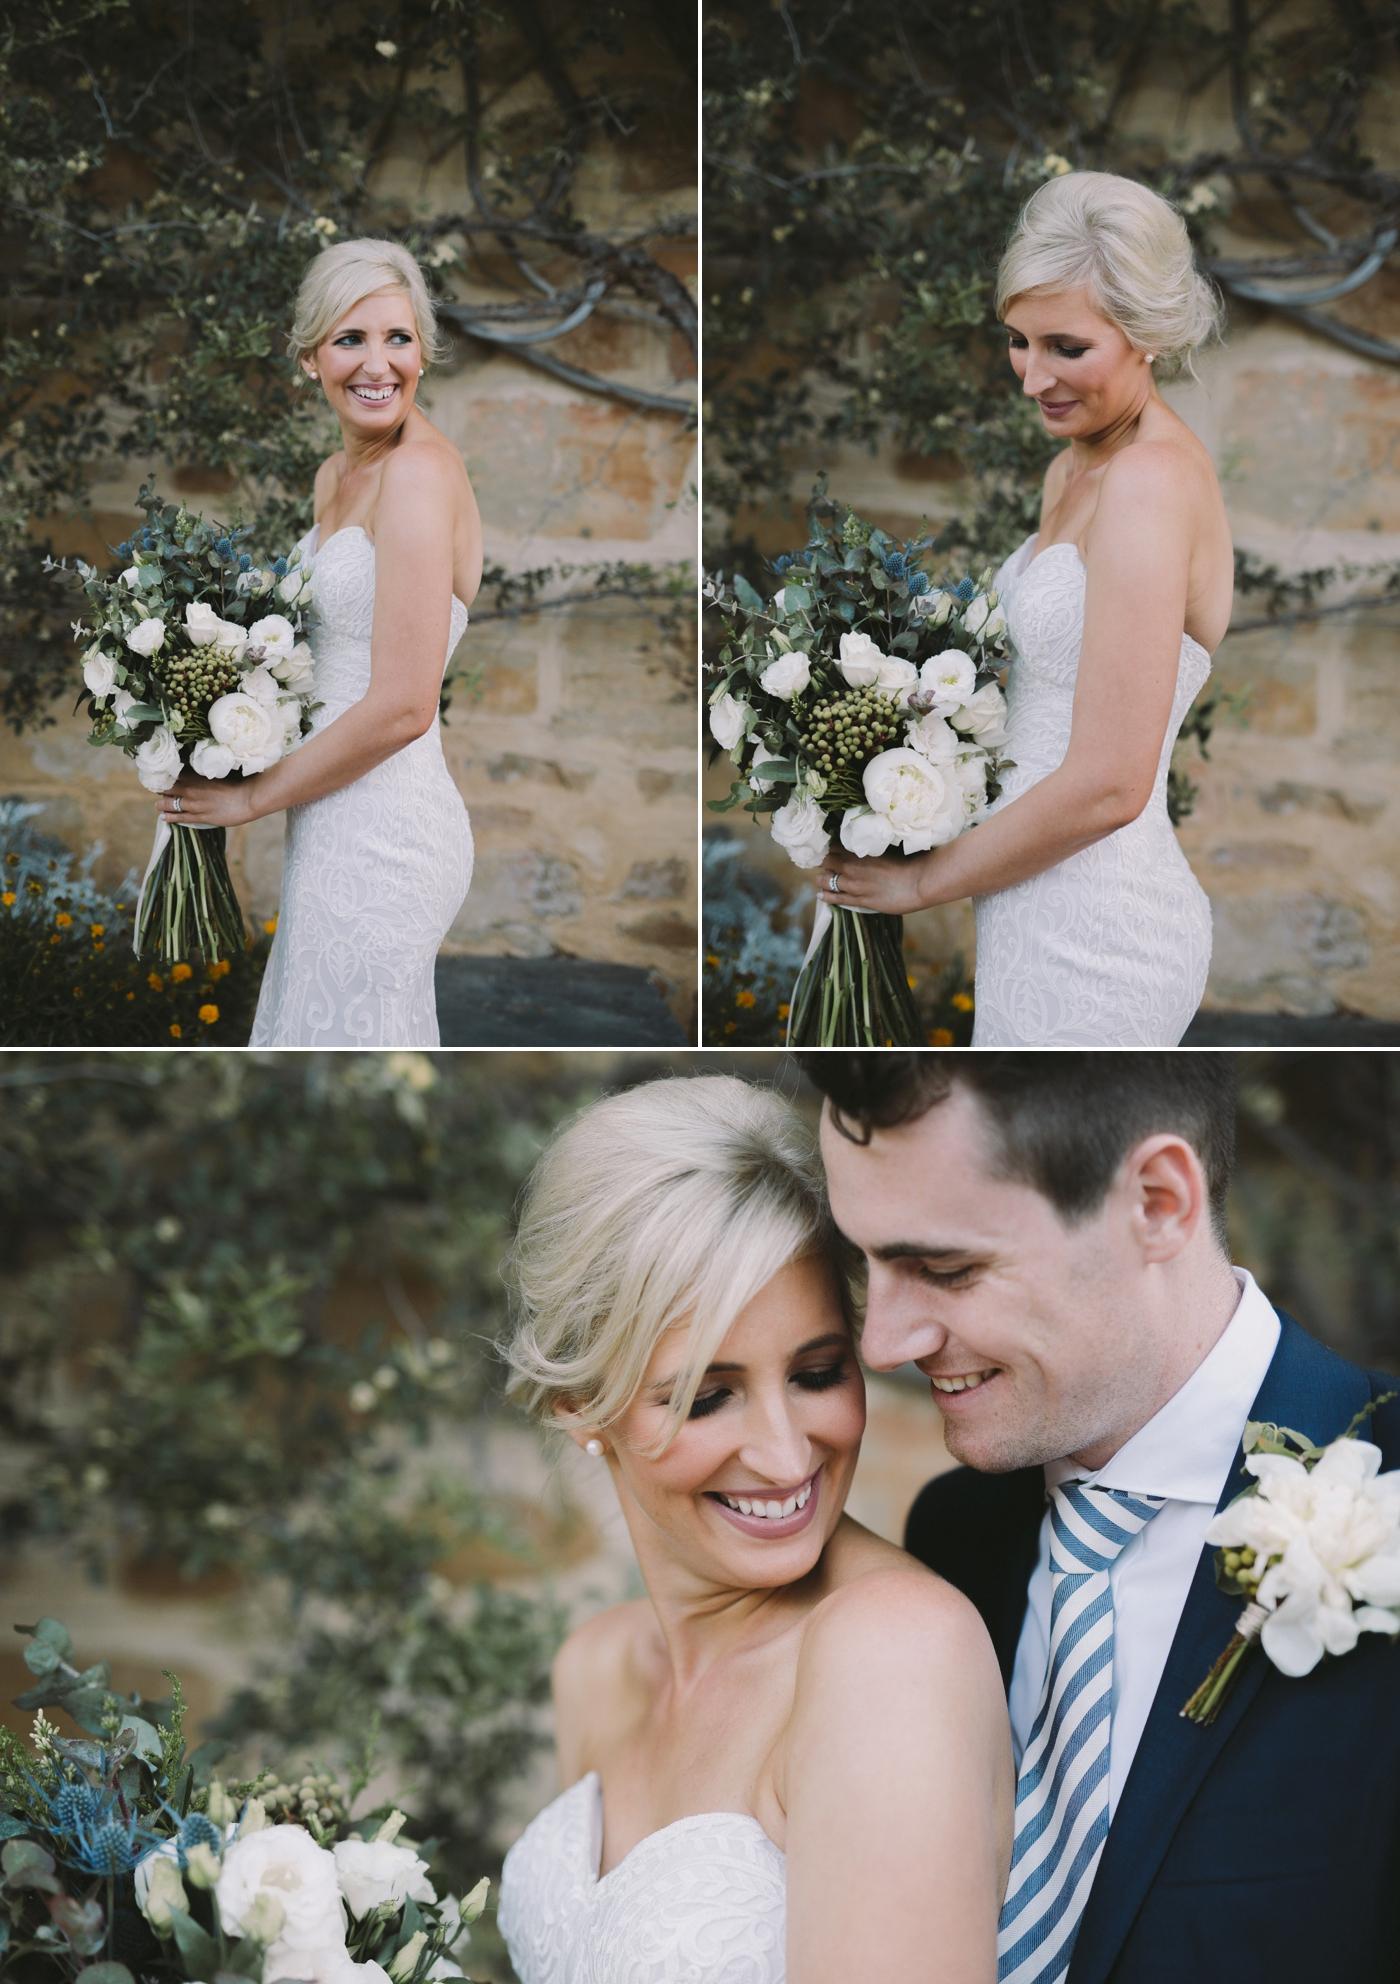 Lauren & Max - Marybank Estate Wedding - Natural wedding photographer in Adelaide - www.katherineschultzphotography.com 102